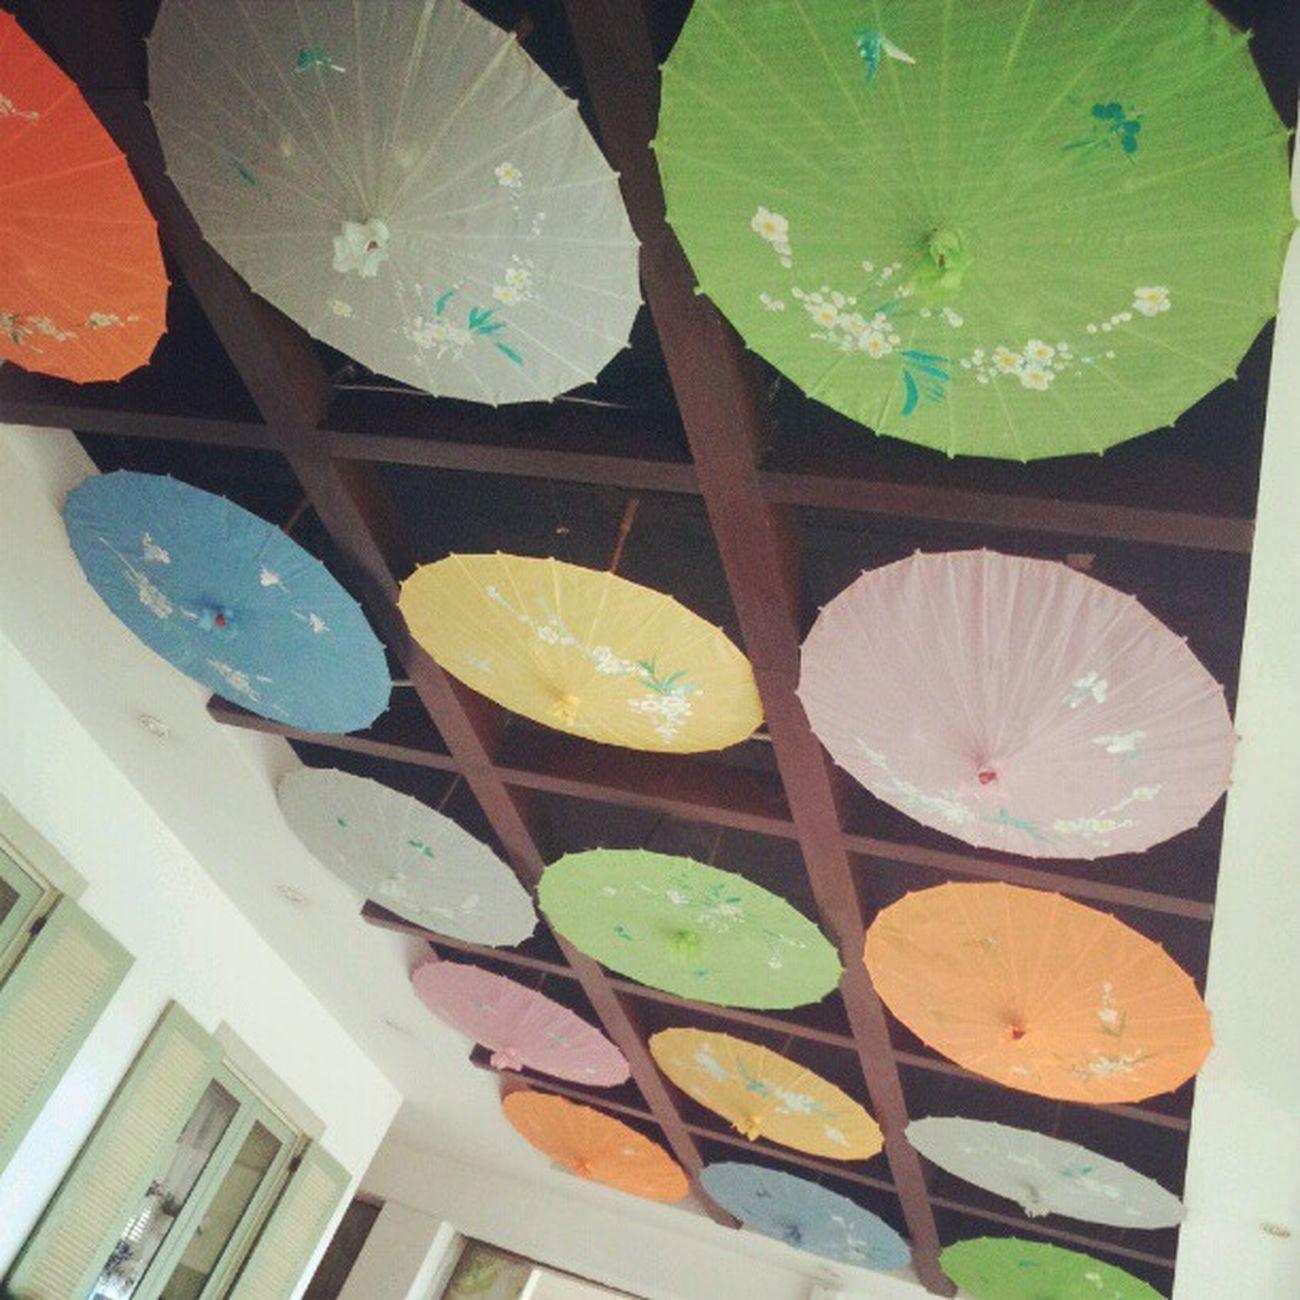 Umbrella Ceiling Cafe Instabanjar instagram pictoftheday